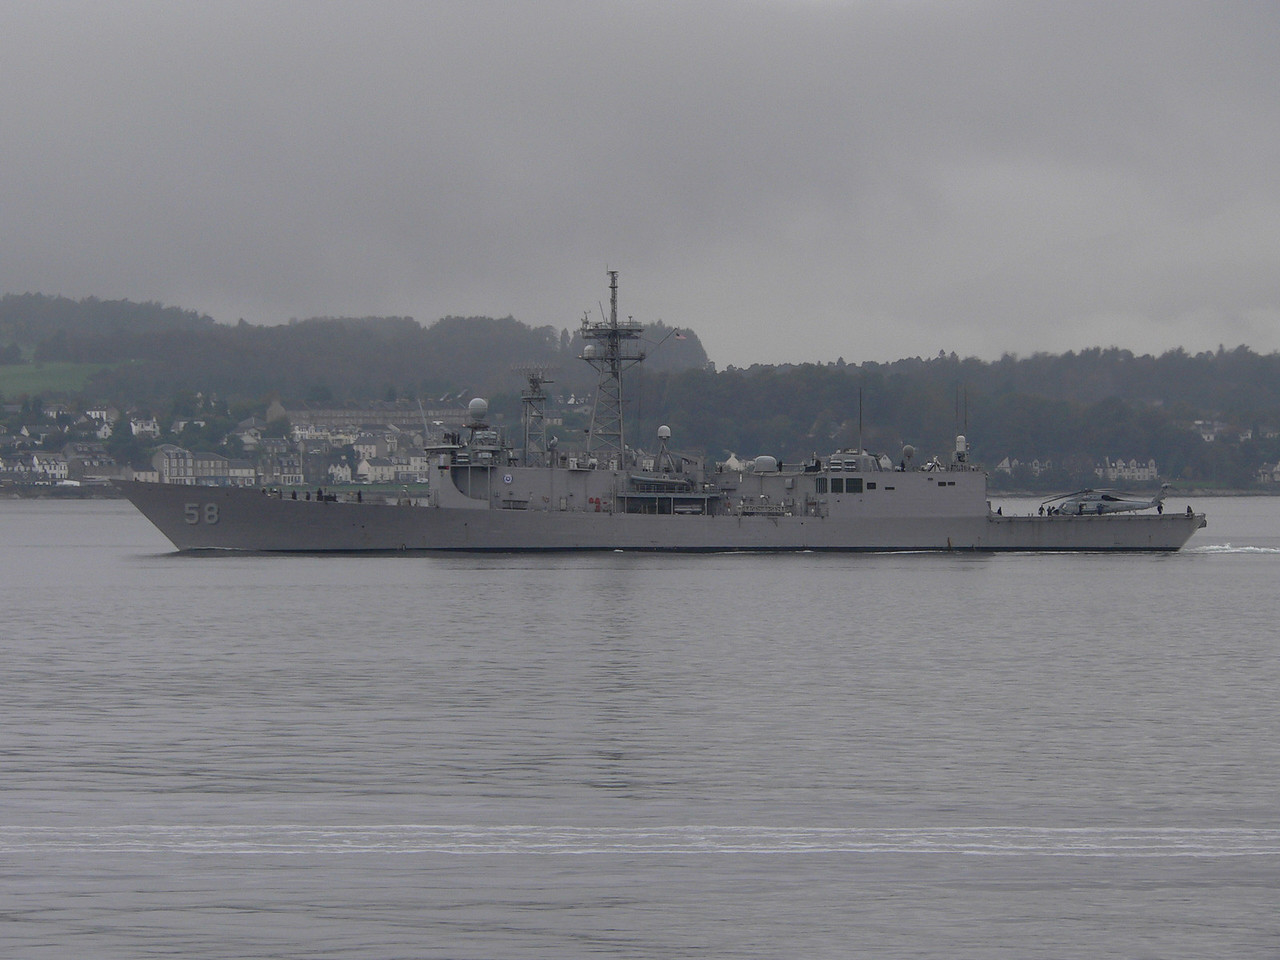 FFG-58 USS SAMUEL B ROBERTS